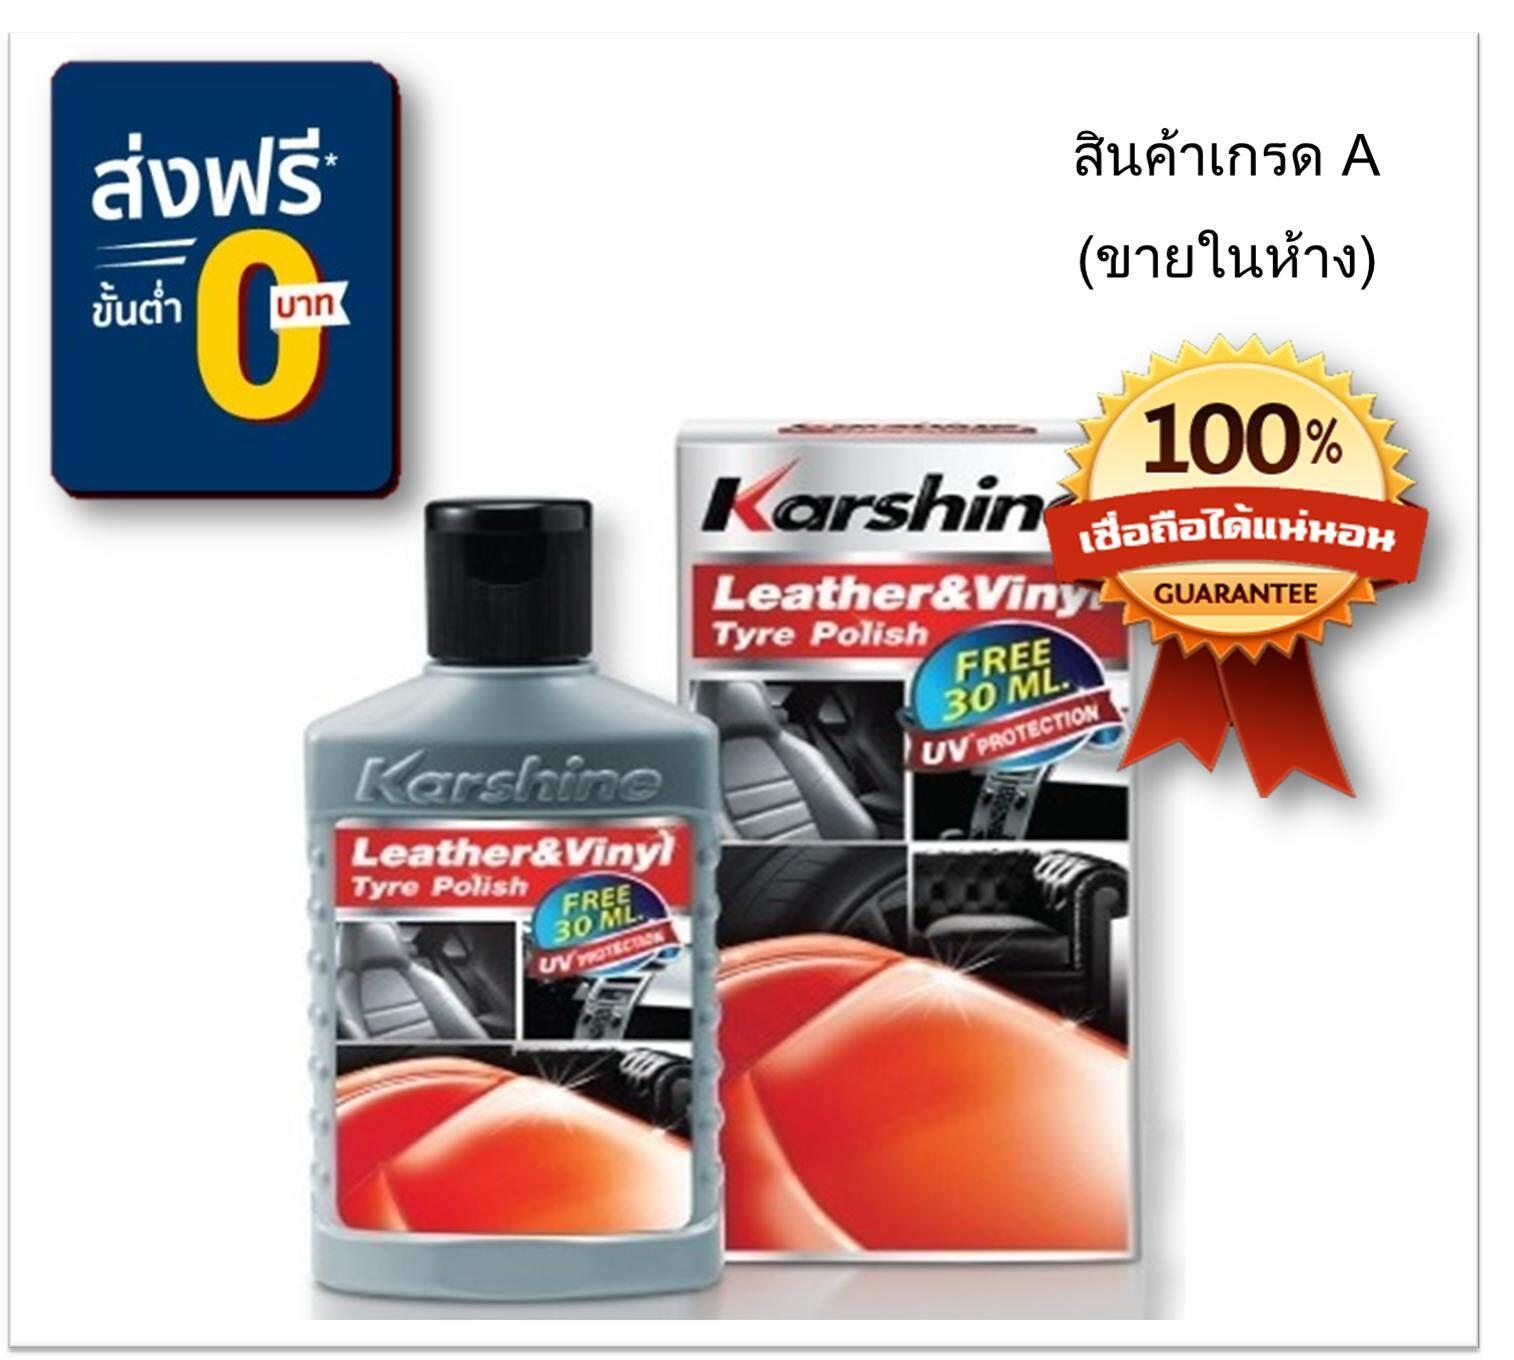 Karshine Leather & Vinyl Tyre Polish น้ำยาบำรุงรักษาและเคลือบเงาเบาะ ป้องกันแสงแดด ฝุ่นละออง 125 Ml ฟรี 30 Ml+ฟองนำ้.